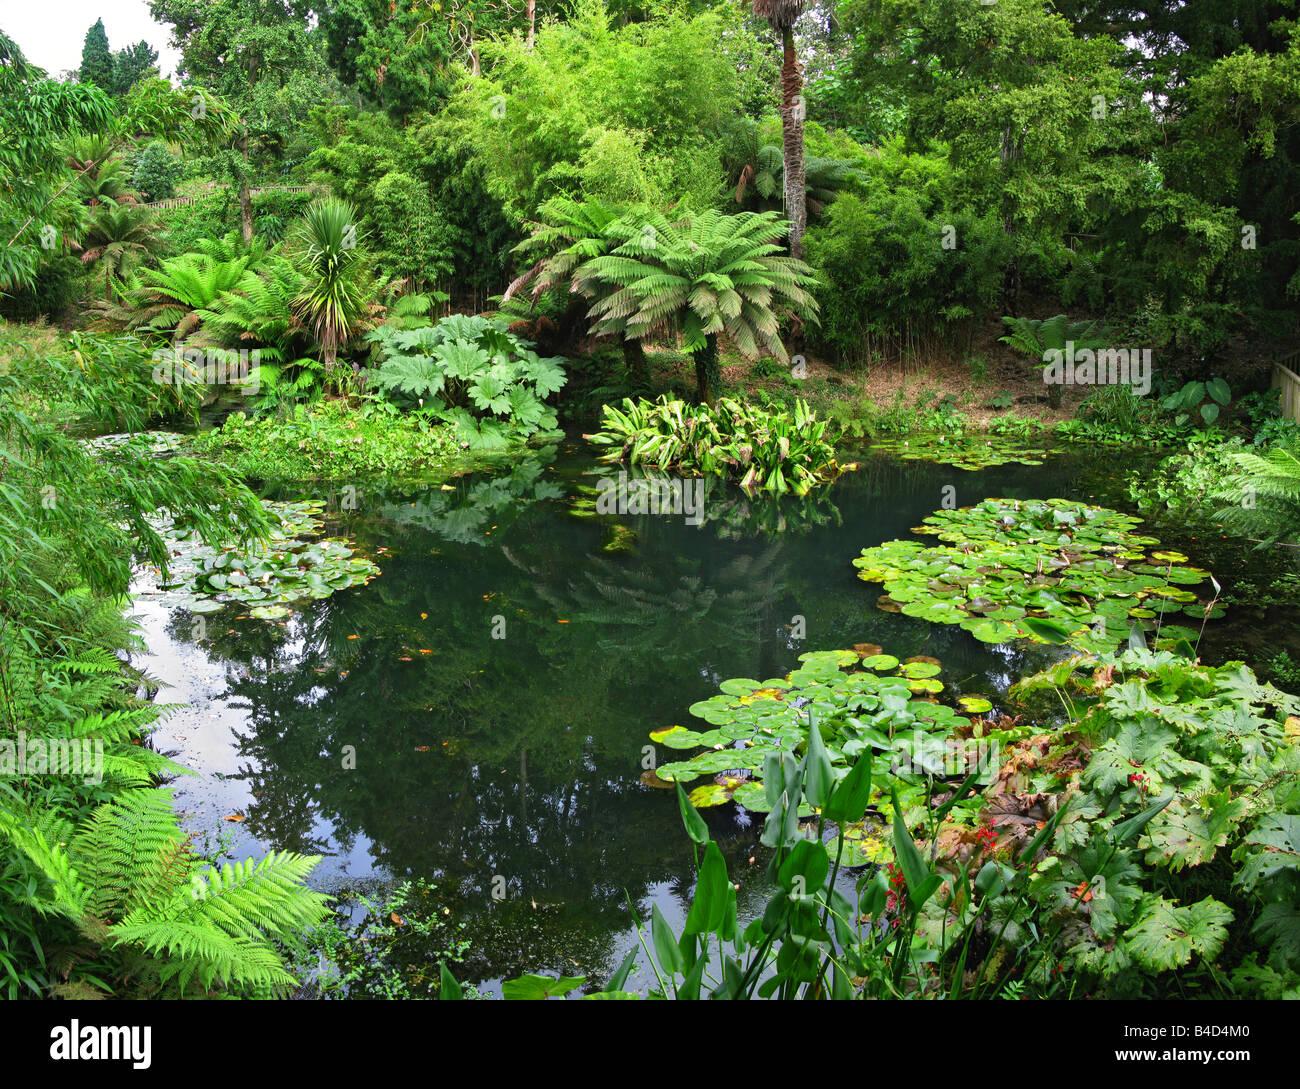 Lost gardens of Heligan,pentewan,st.Austell,Cornwall,england - Stock Image